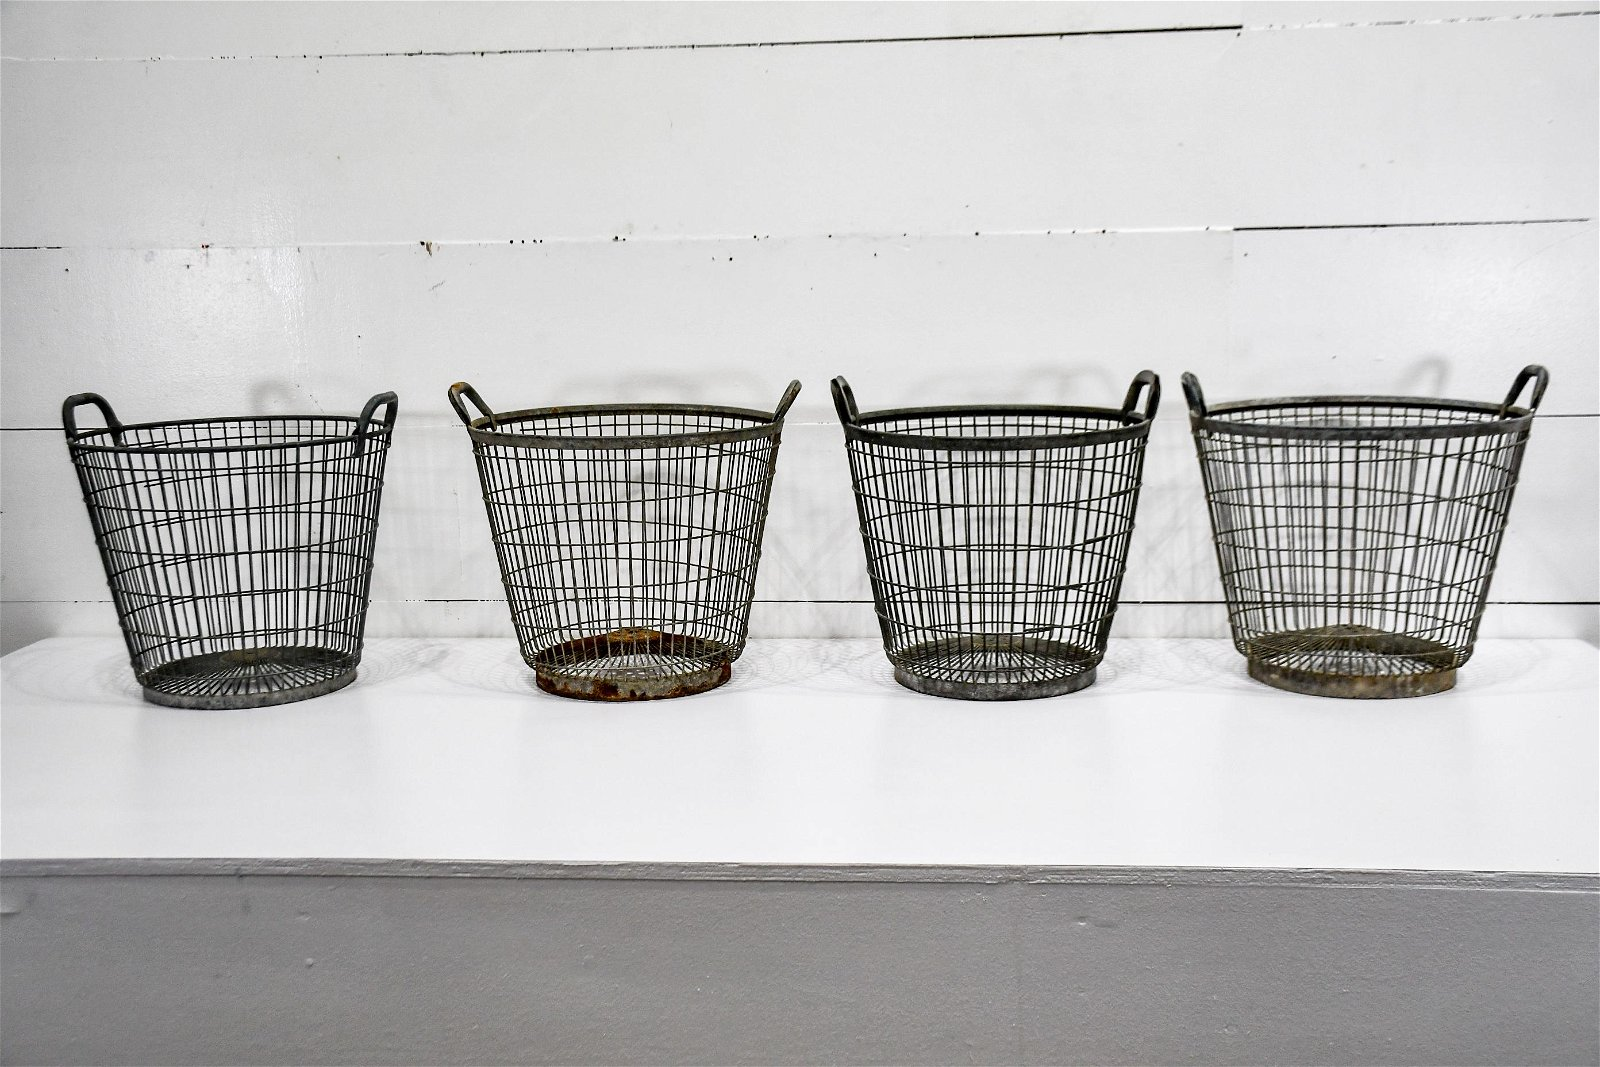 4pc. Lot of Metal Gathering Baskets biggest     -